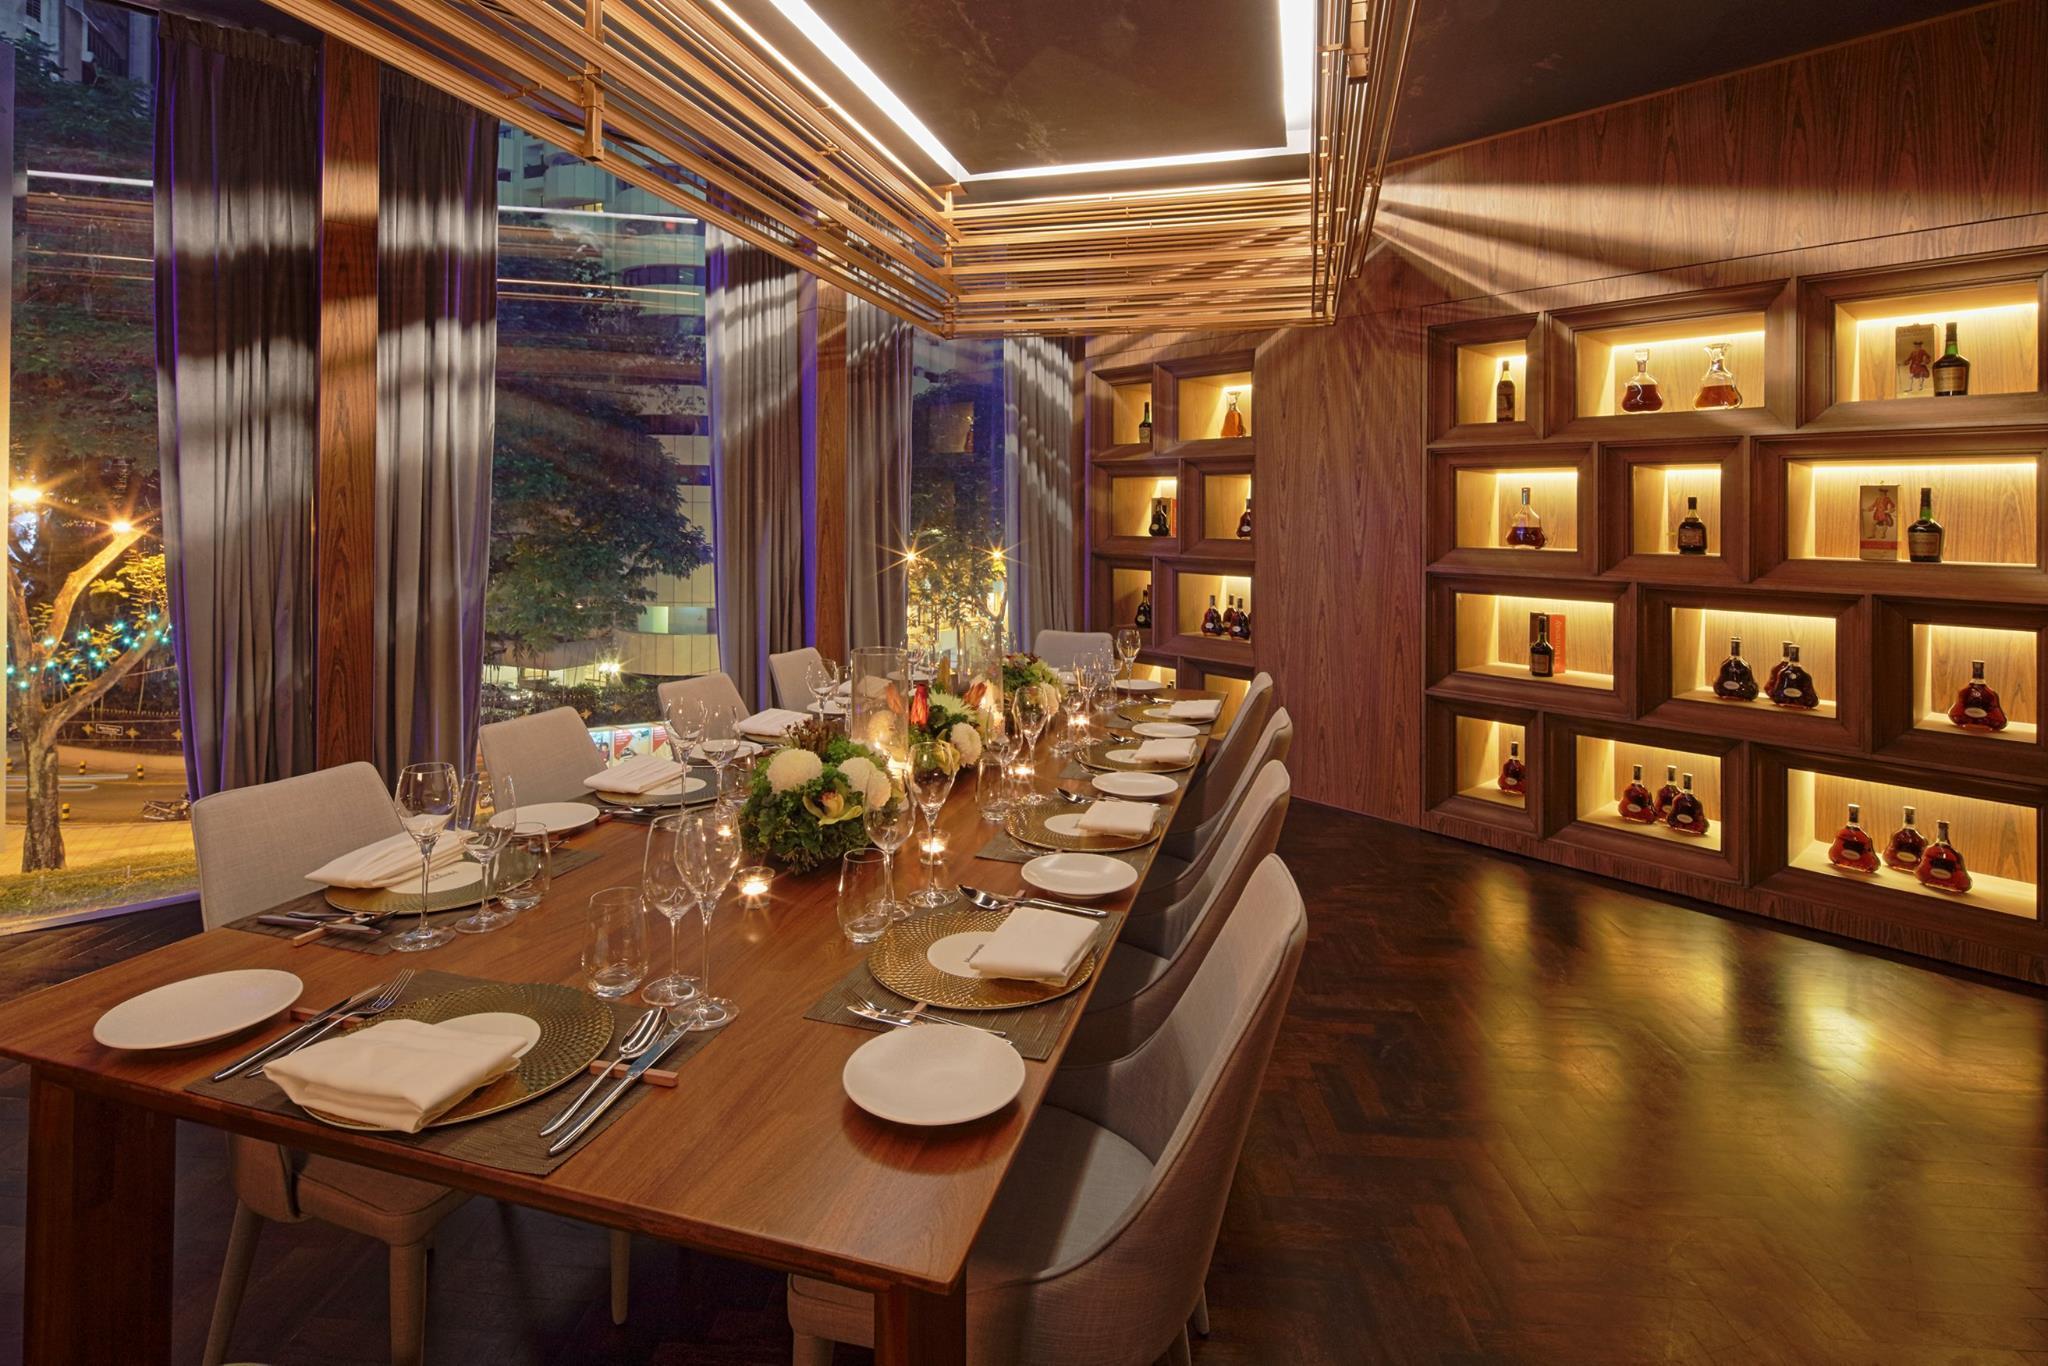 The best multi-course restaurants in KL